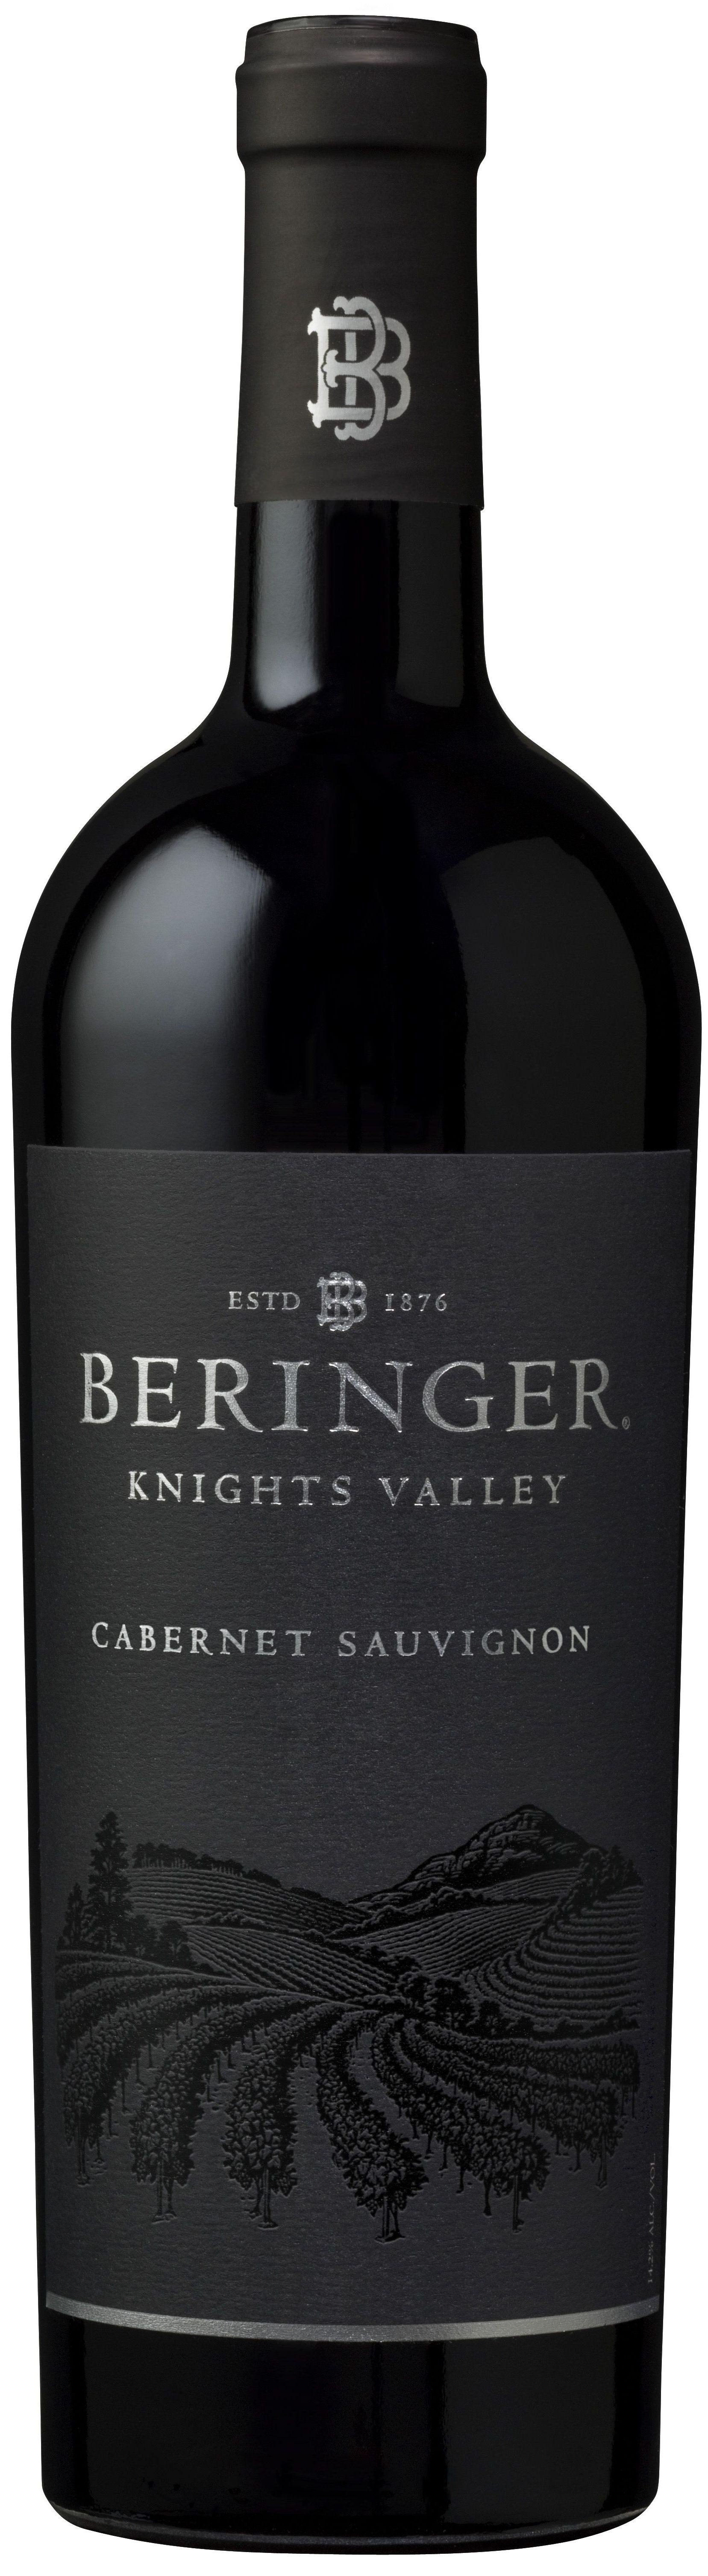 Beringer Knight Valley, Cabernet Sauvignon